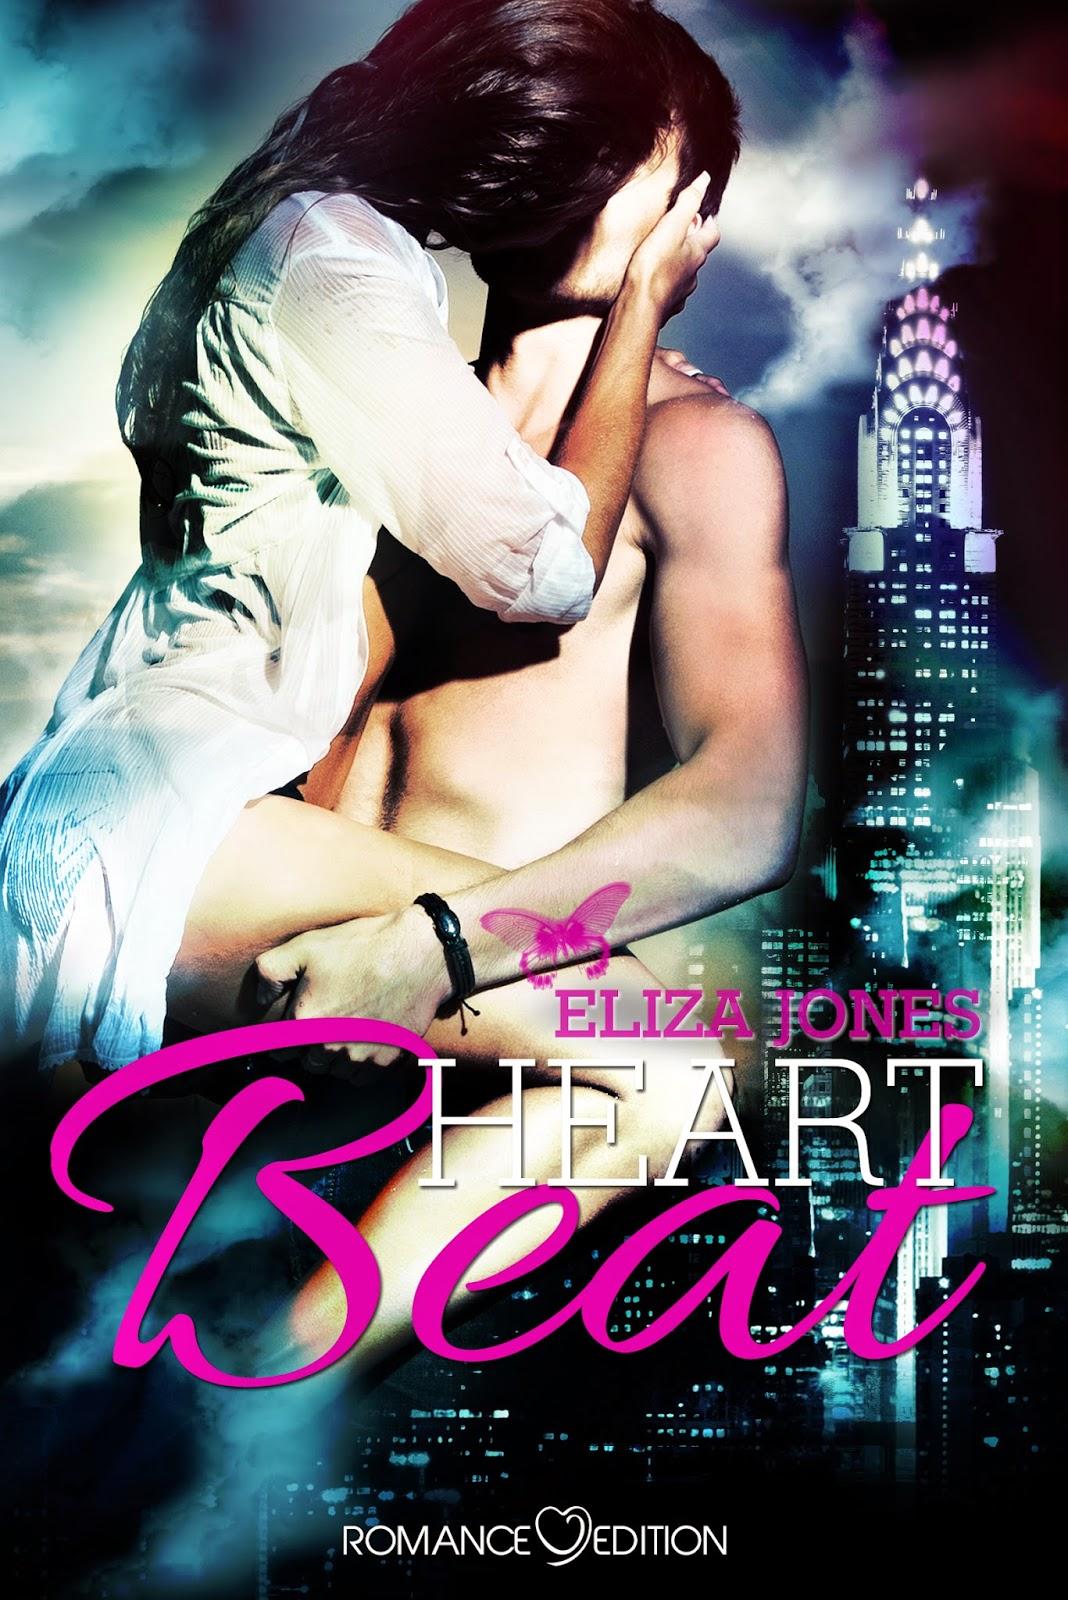 http://www.romance-edition.com/programm/heart-beat-von-eliza-jones/